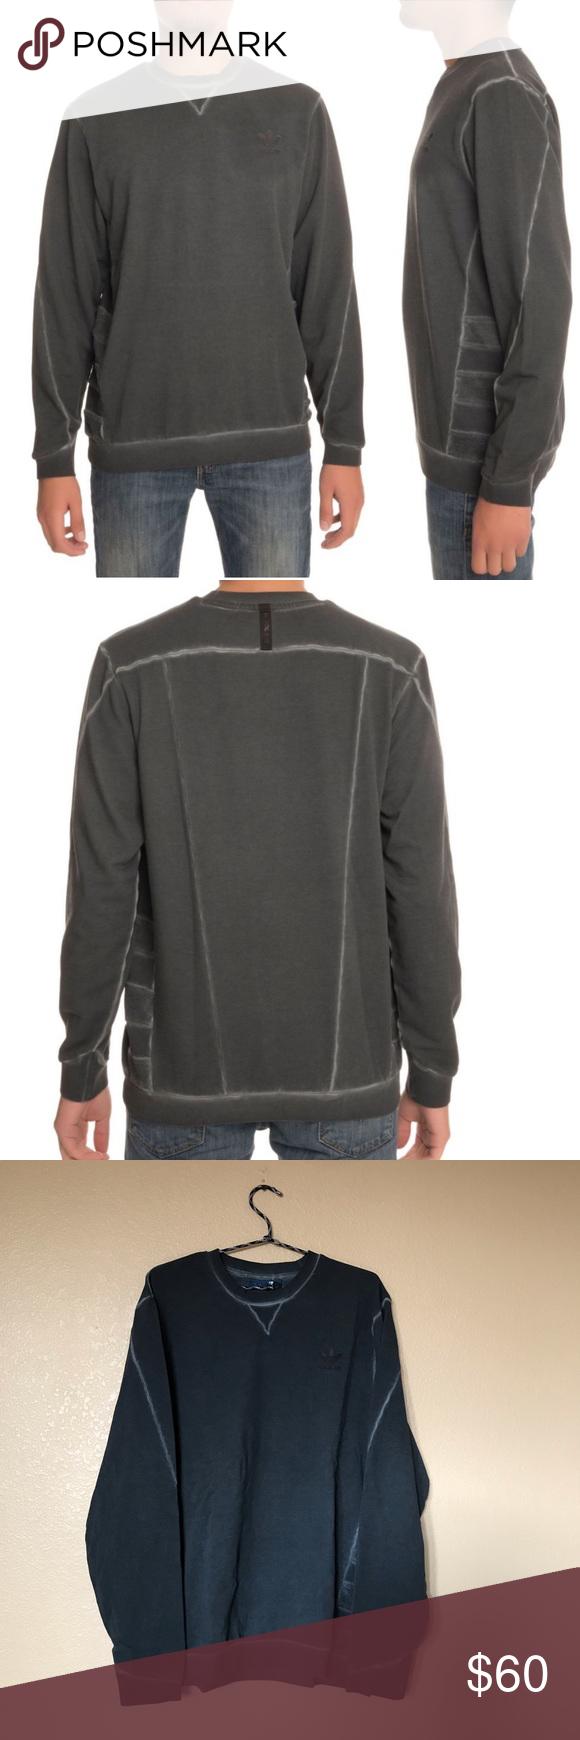 Adidas St Mod Dye Crewneck Sweatshirt Dark Gray Clothes Design Grey Crewneck Crew Neck Sweatshirt [ 1740 x 580 Pixel ]